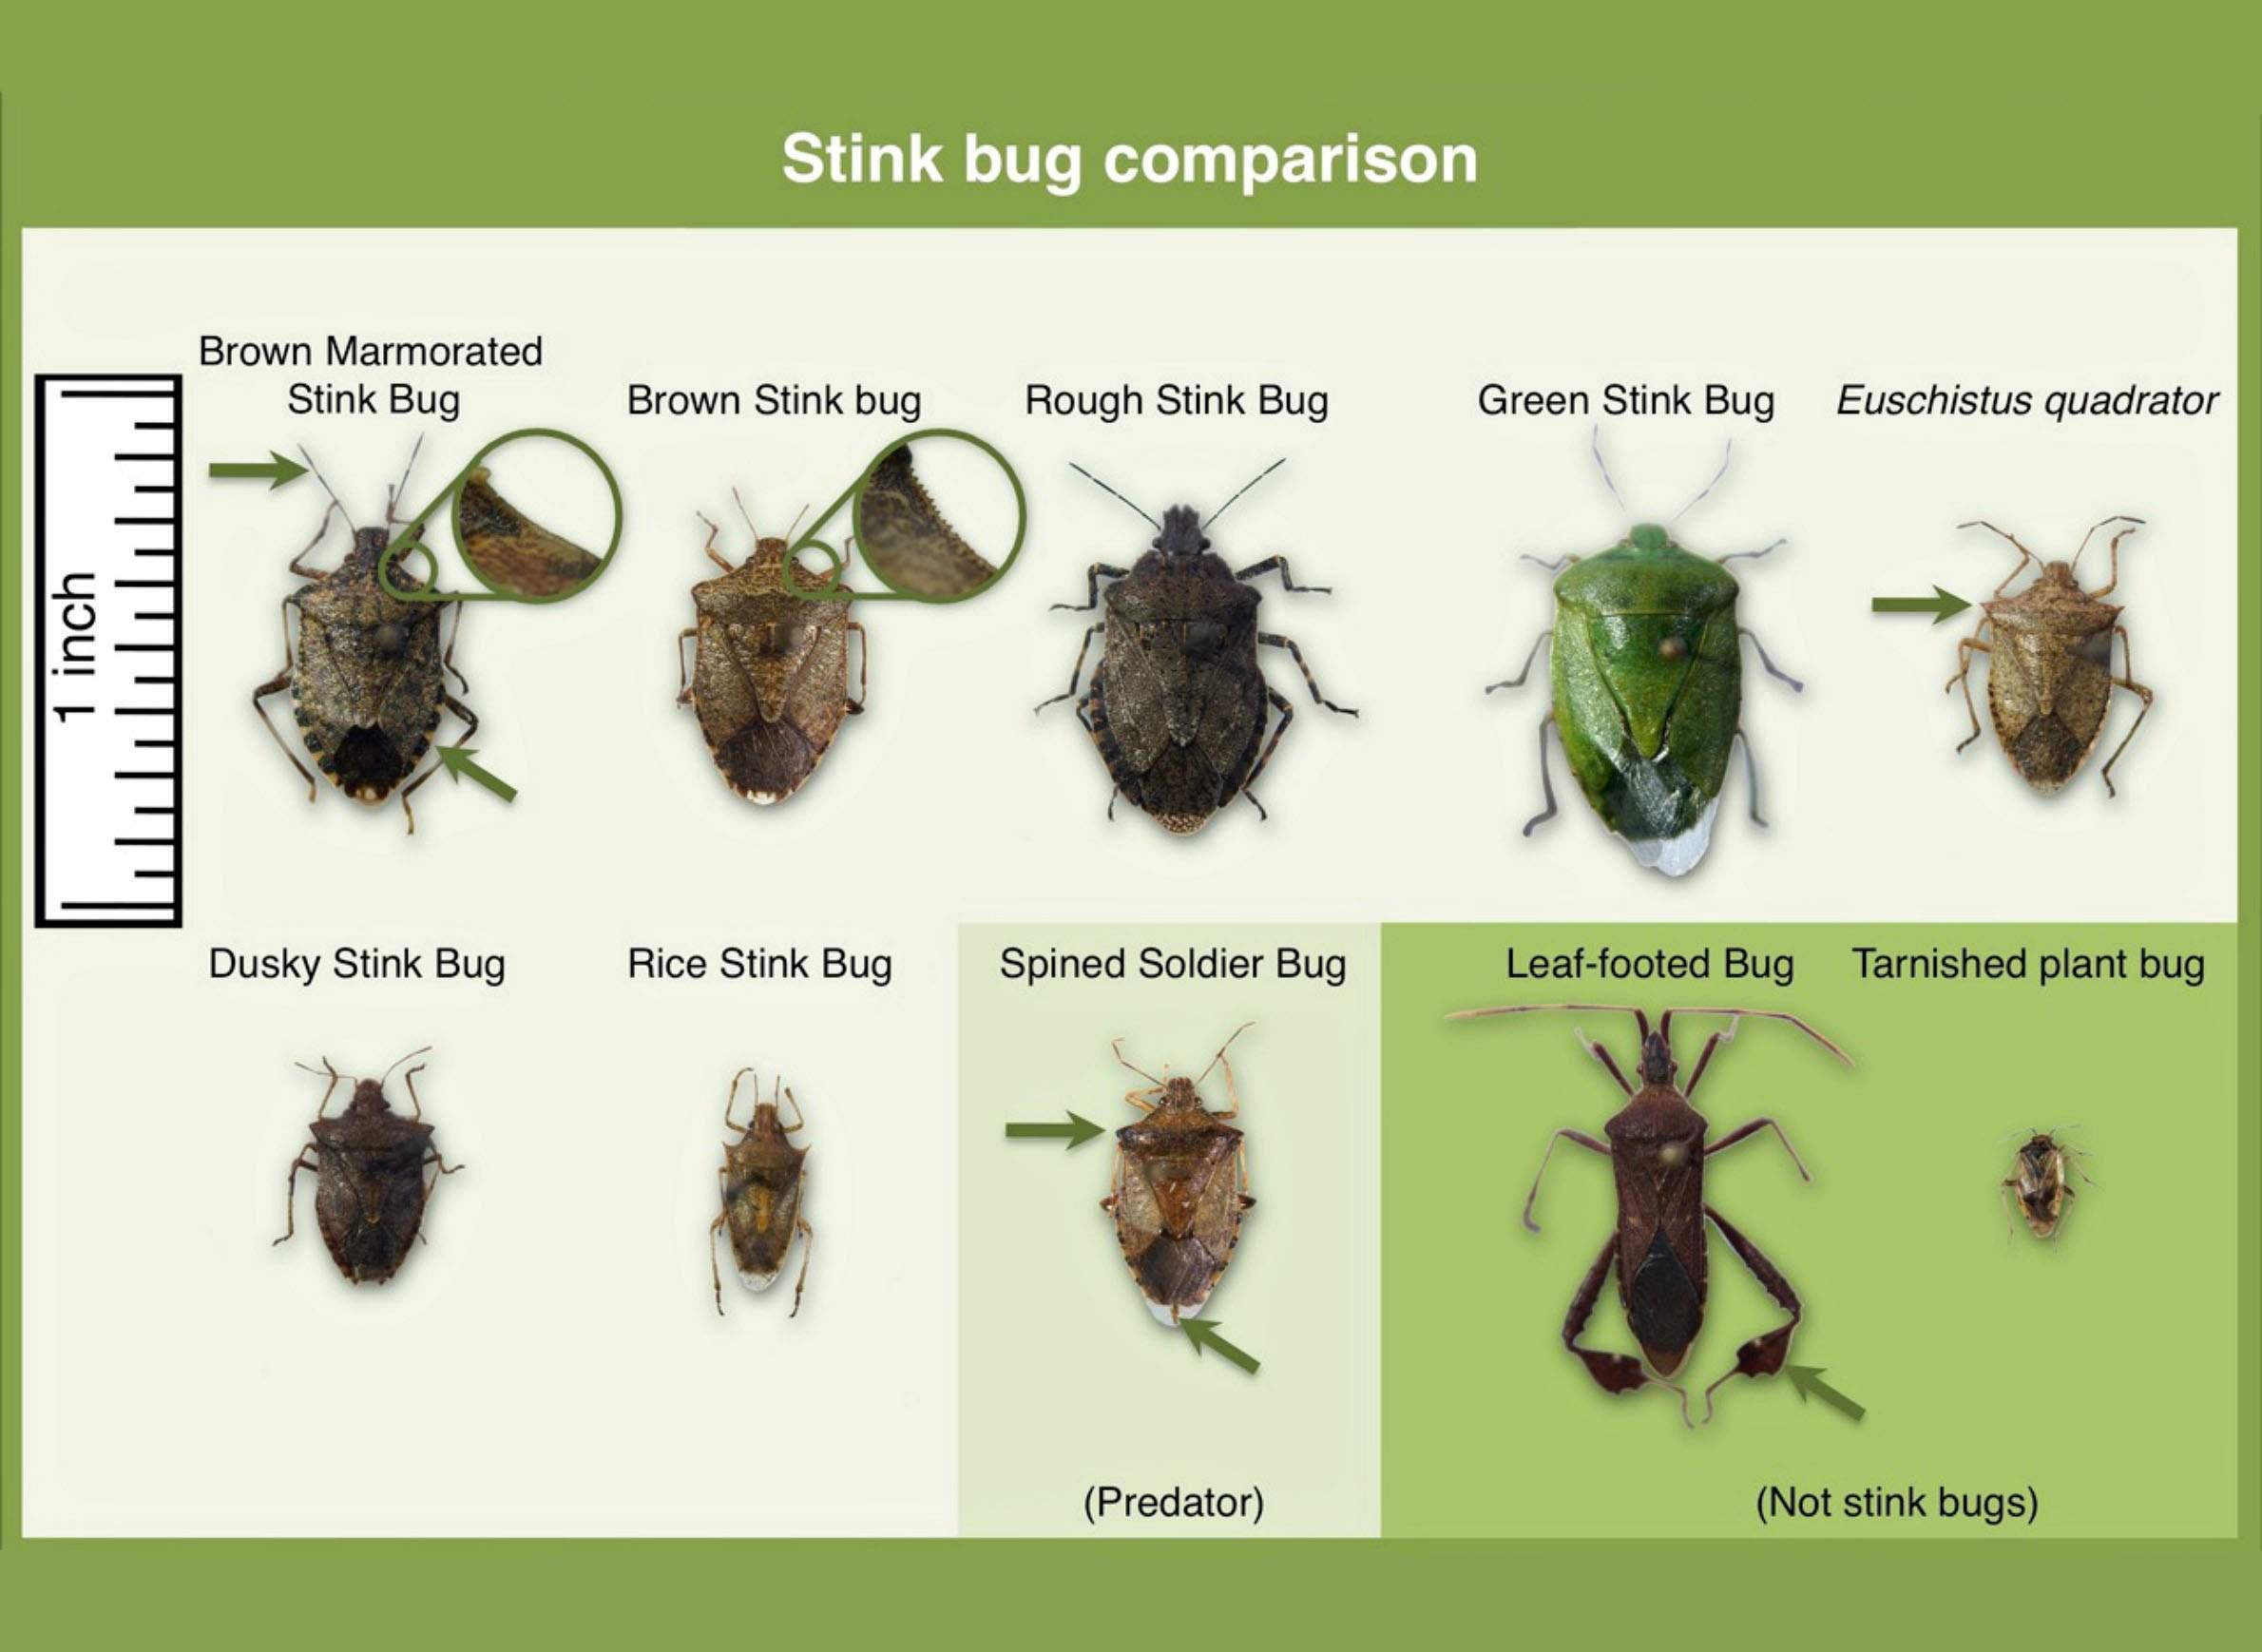 Comparison of stink bug species